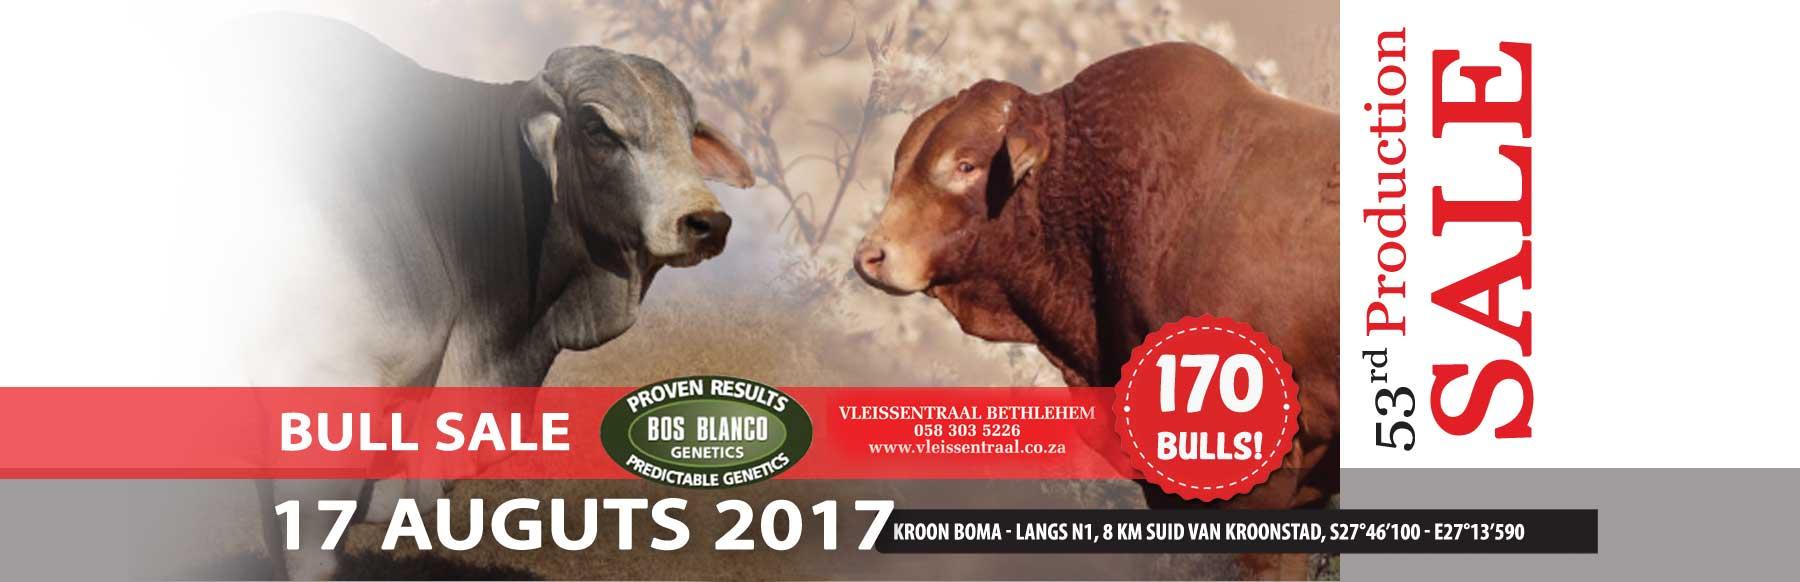 Beefmaster-Bull-Sale-slider-Bos-Blanco